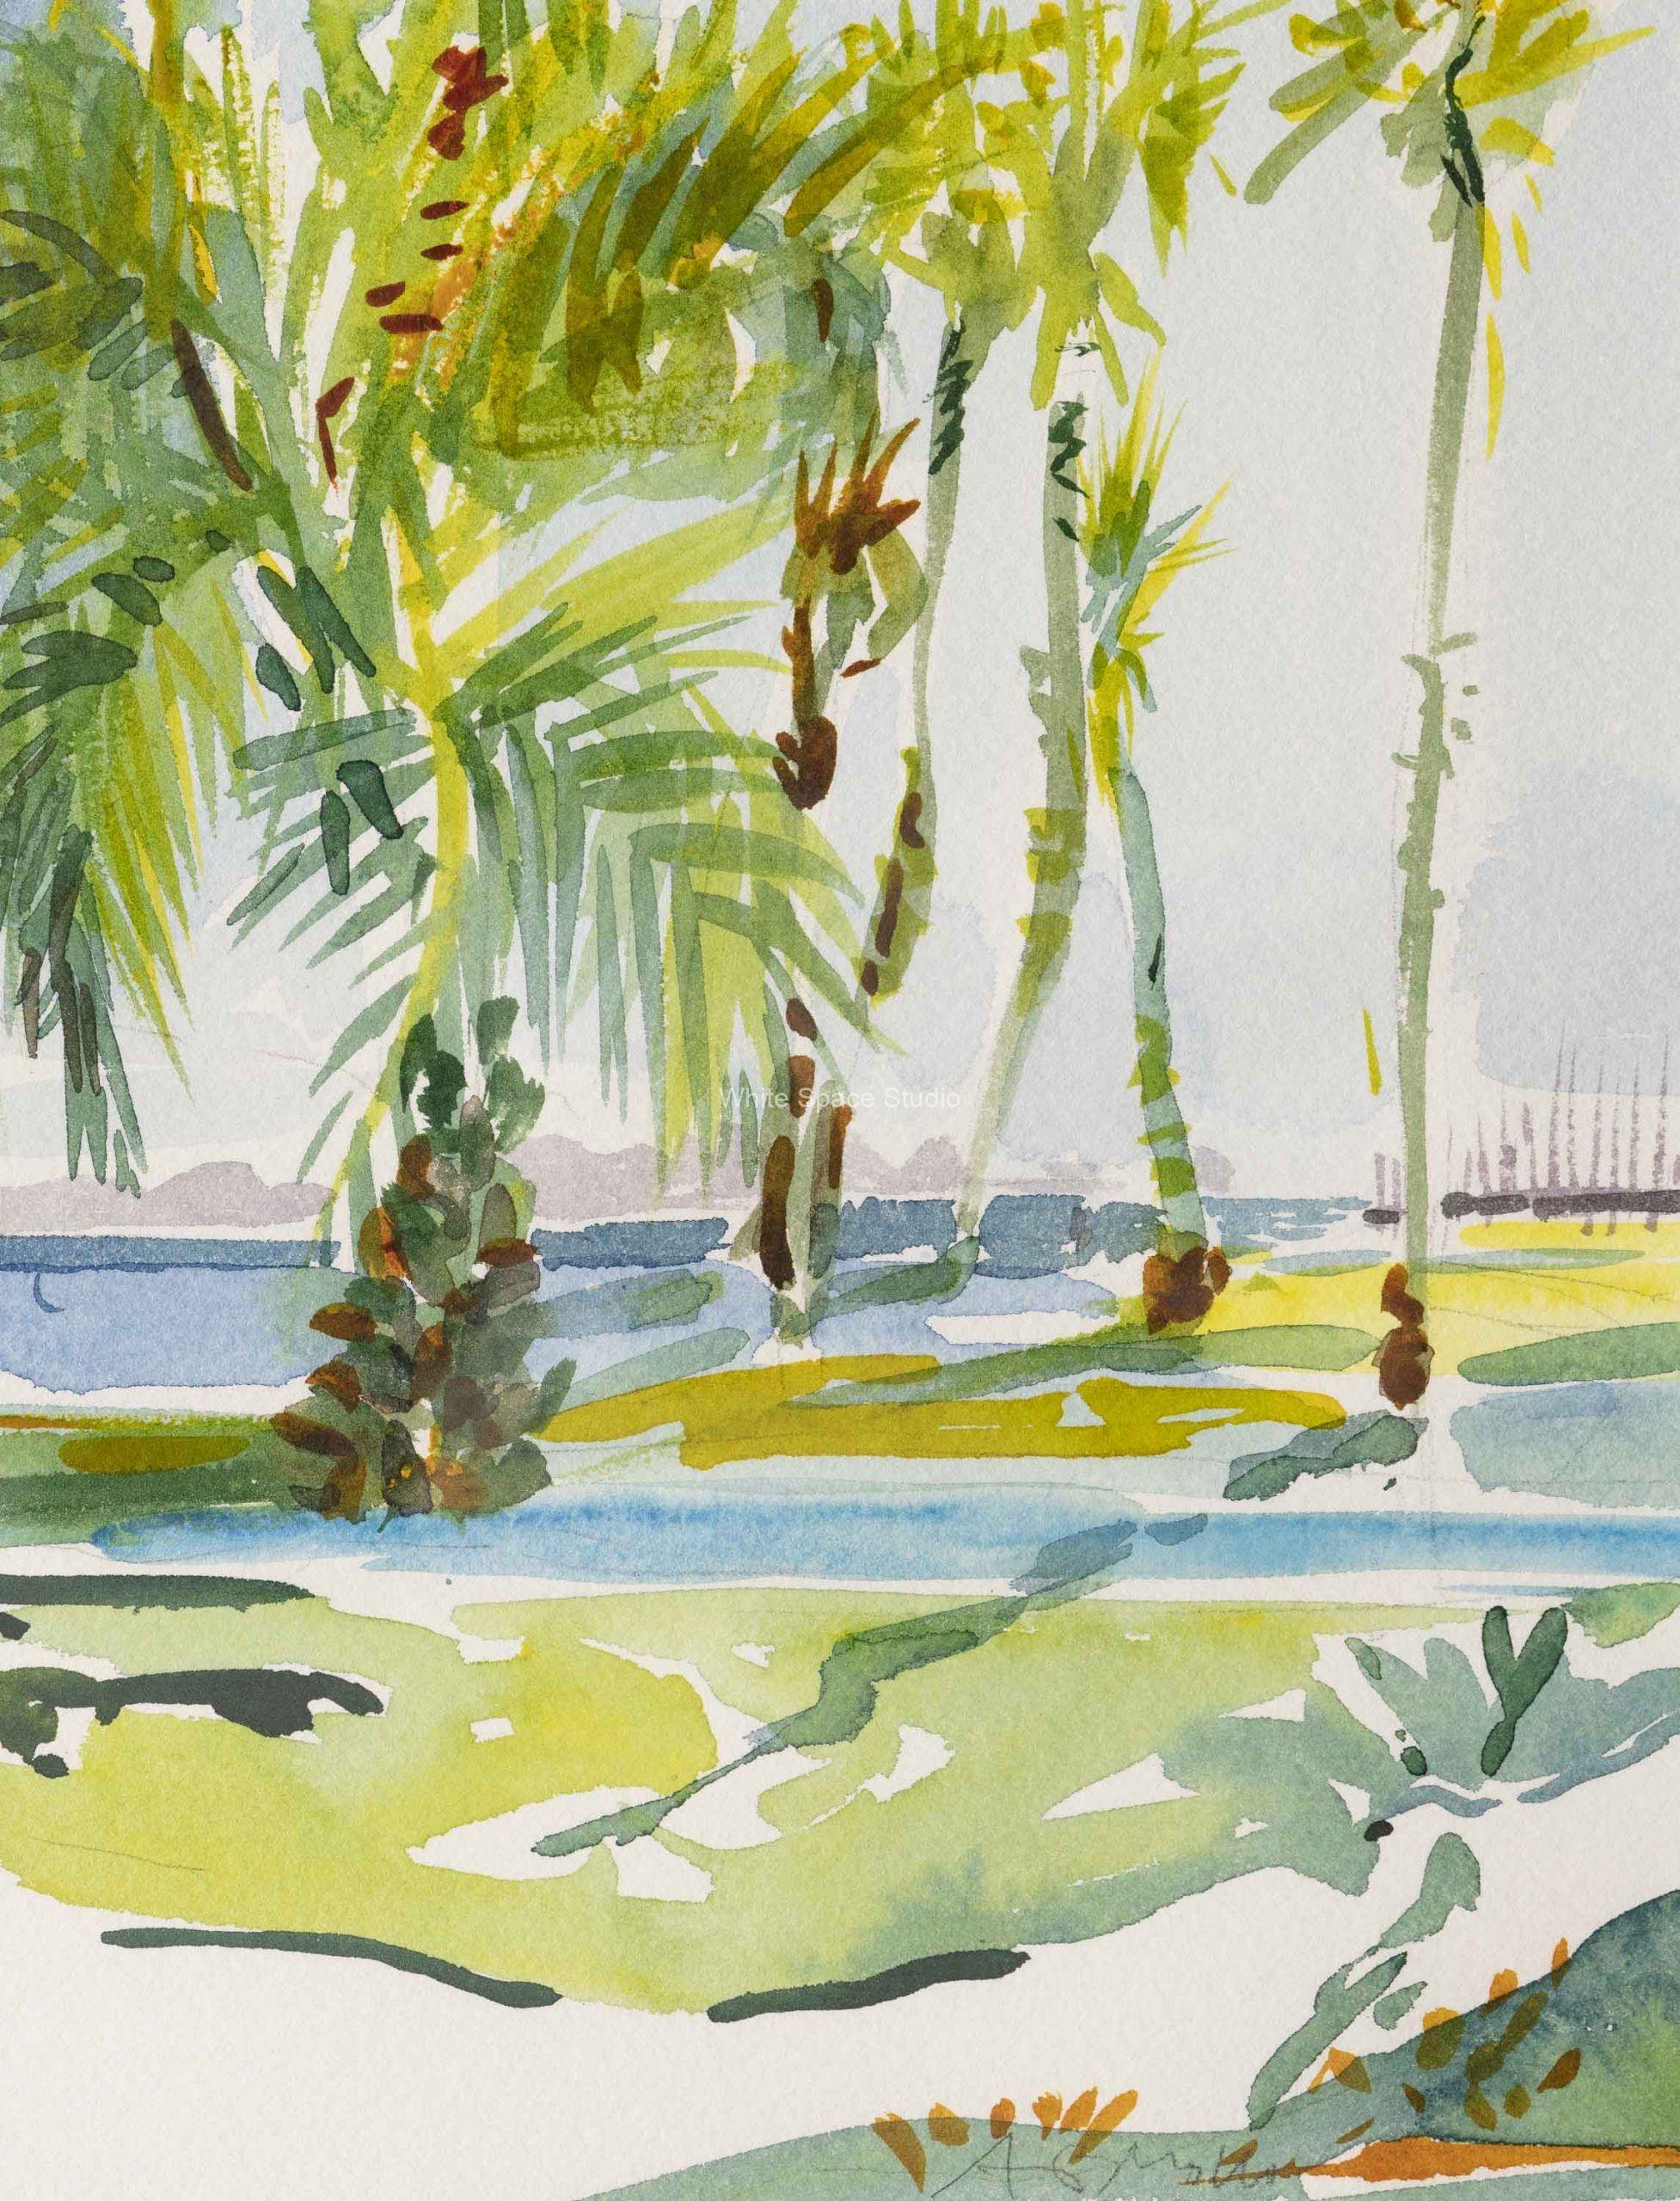 East Beach Palms Santa Barbara California Arlene Black Mollo Watercolor Artwork